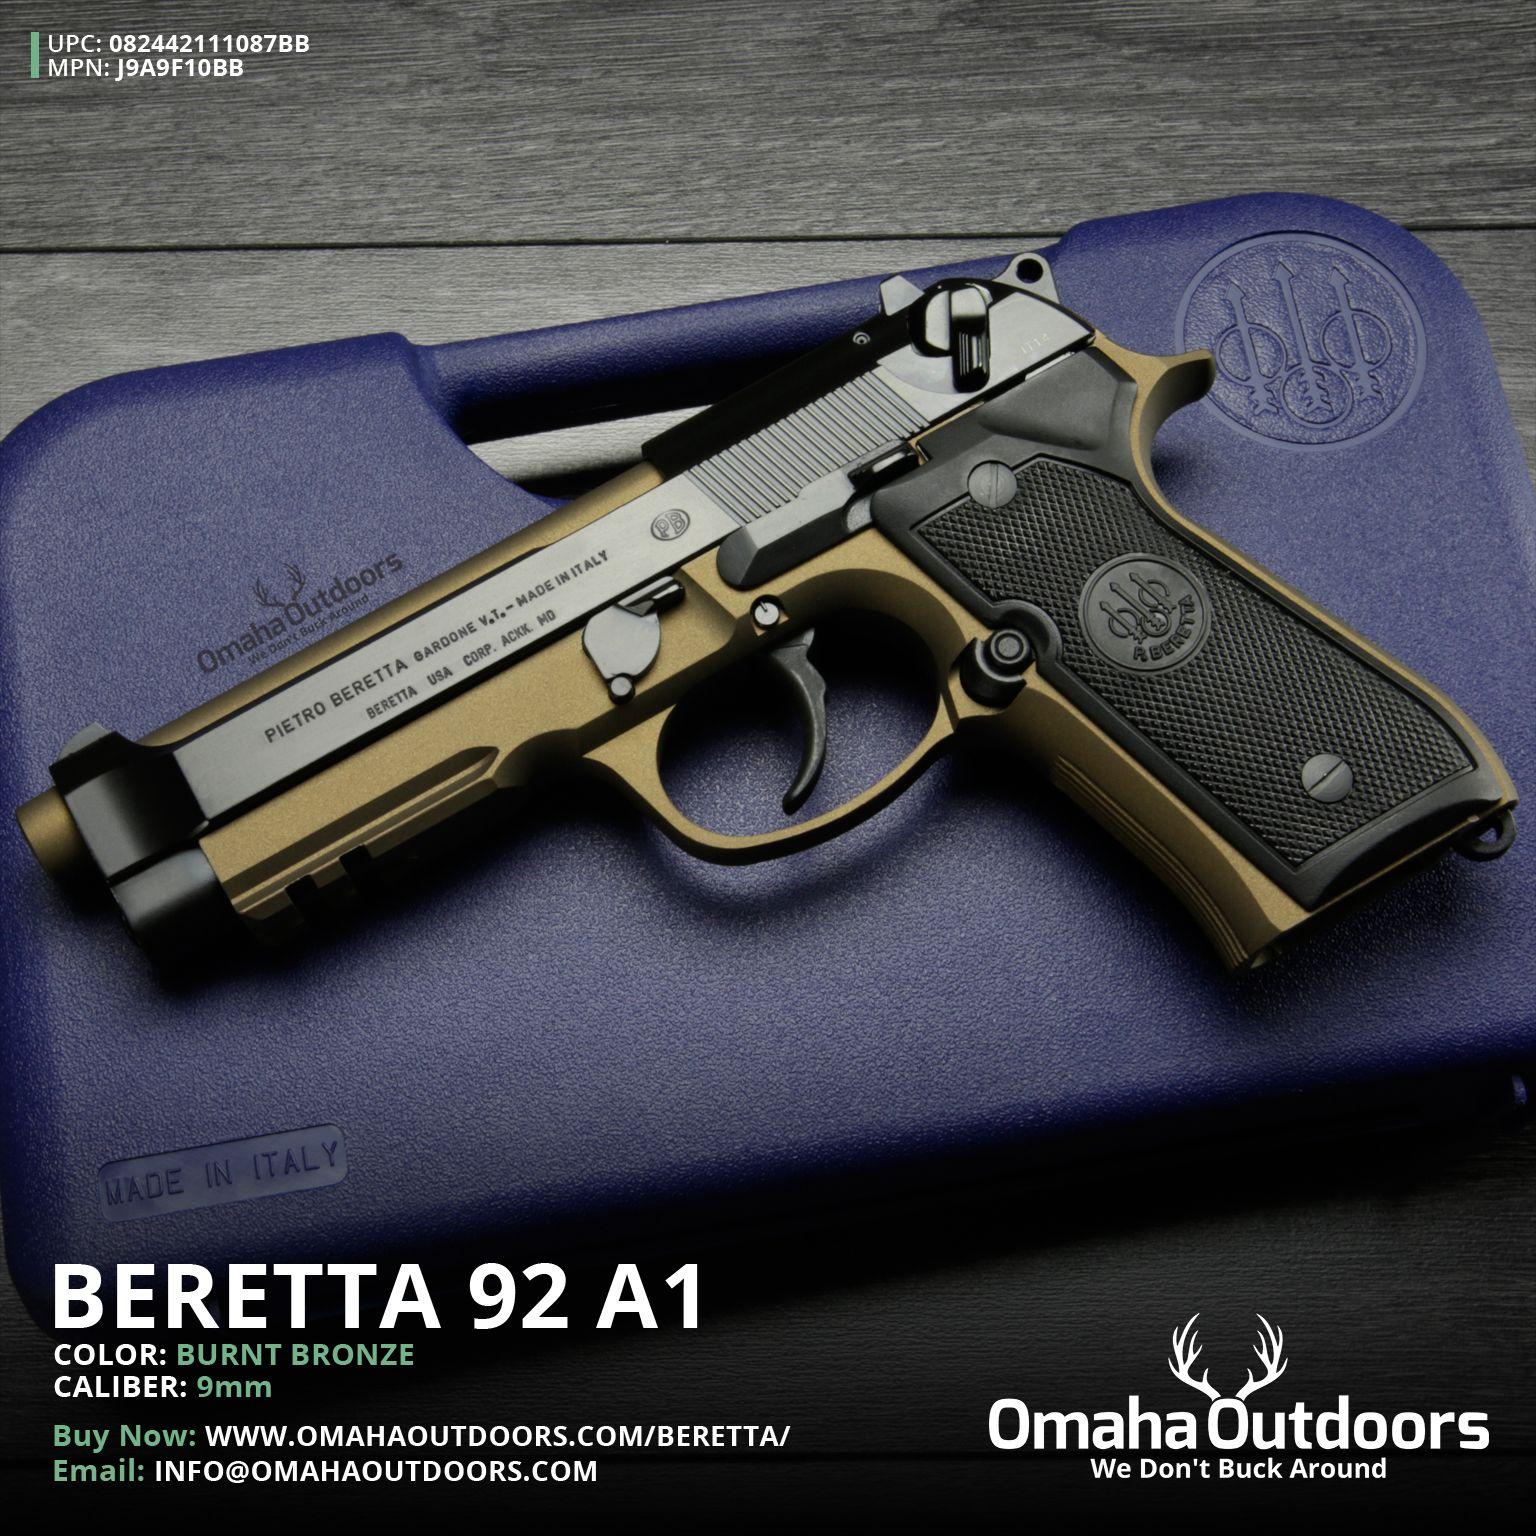 Beretta 92A1 17rd capacity  Under barrel rail system  And a